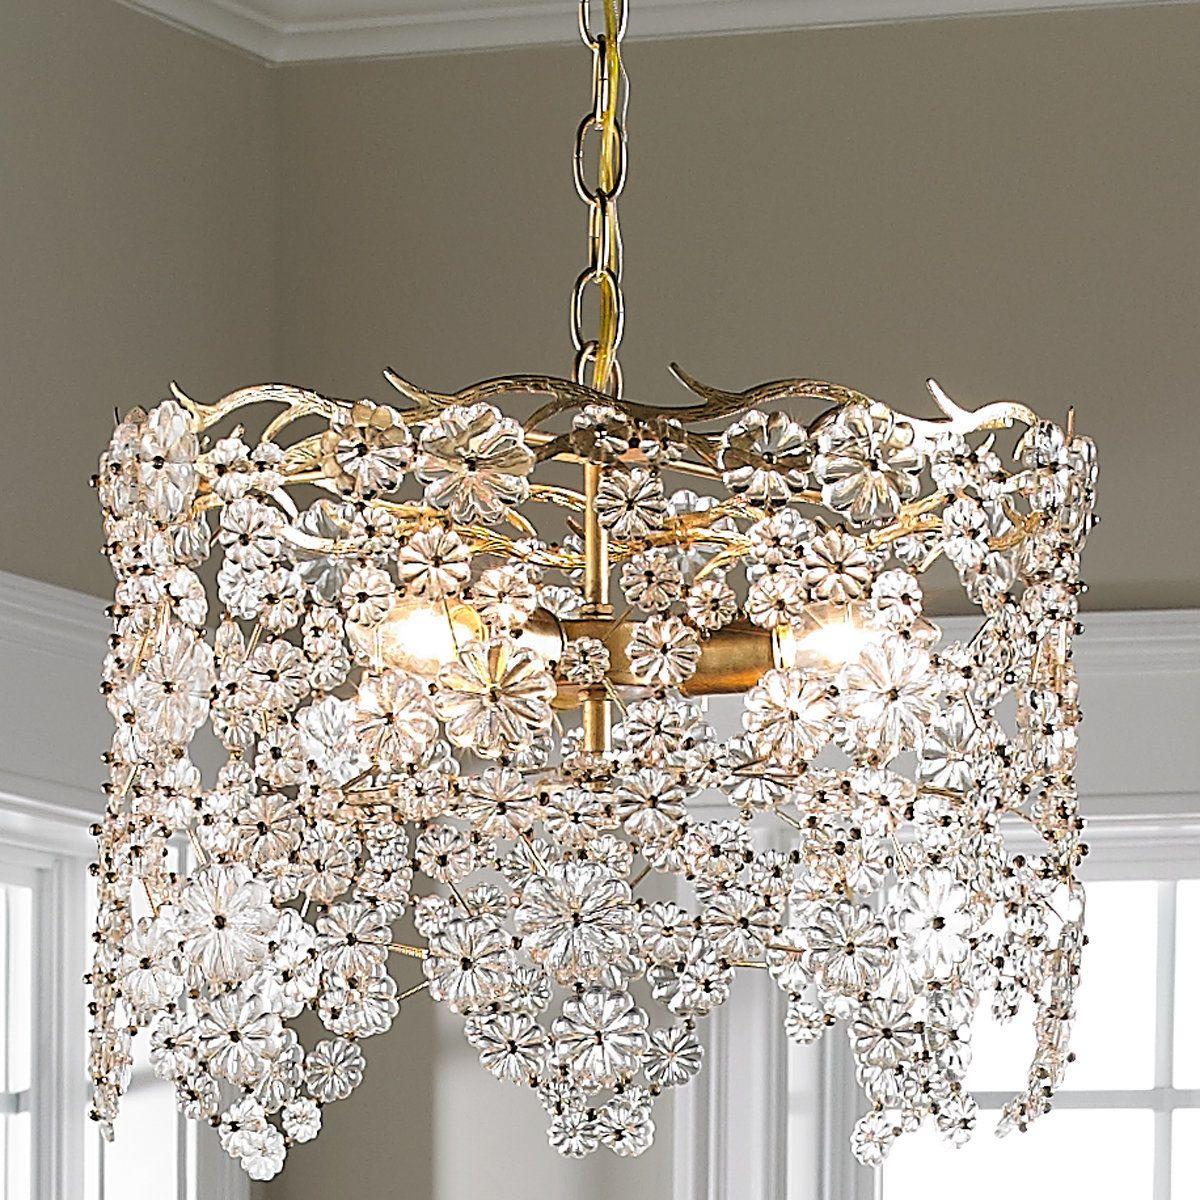 Glass lace drum chandelier goldleaf 43z rework pinterest drum glass lace drum chandelier goldleaf arubaitofo Choice Image